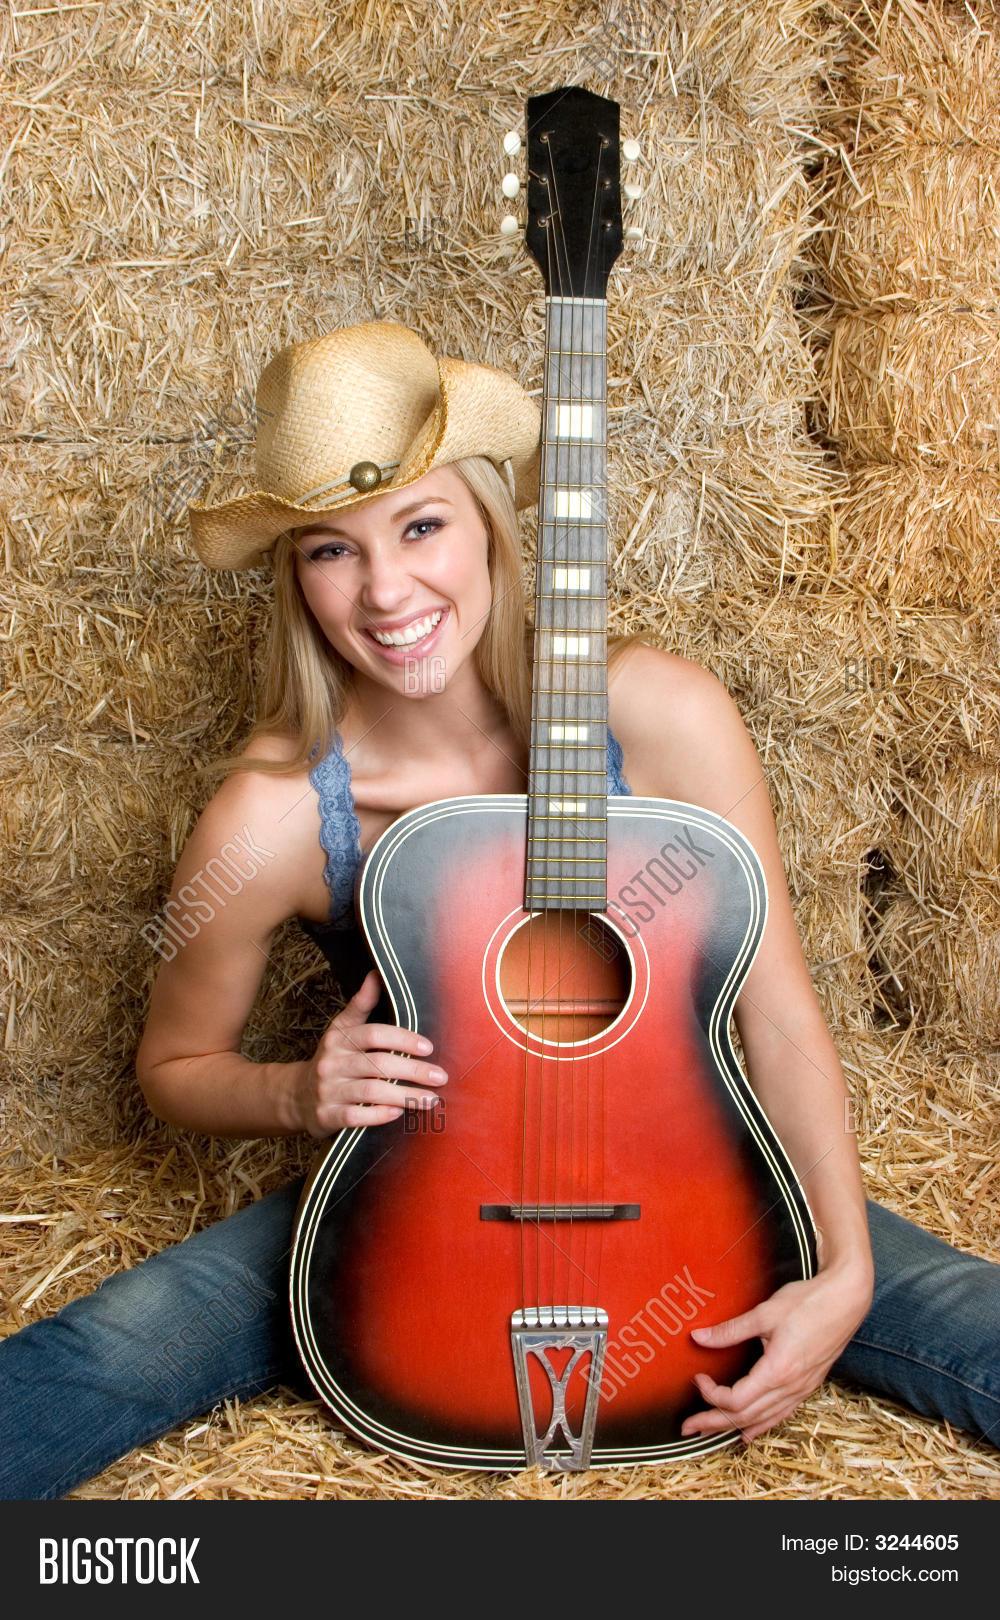 country girl guitar image